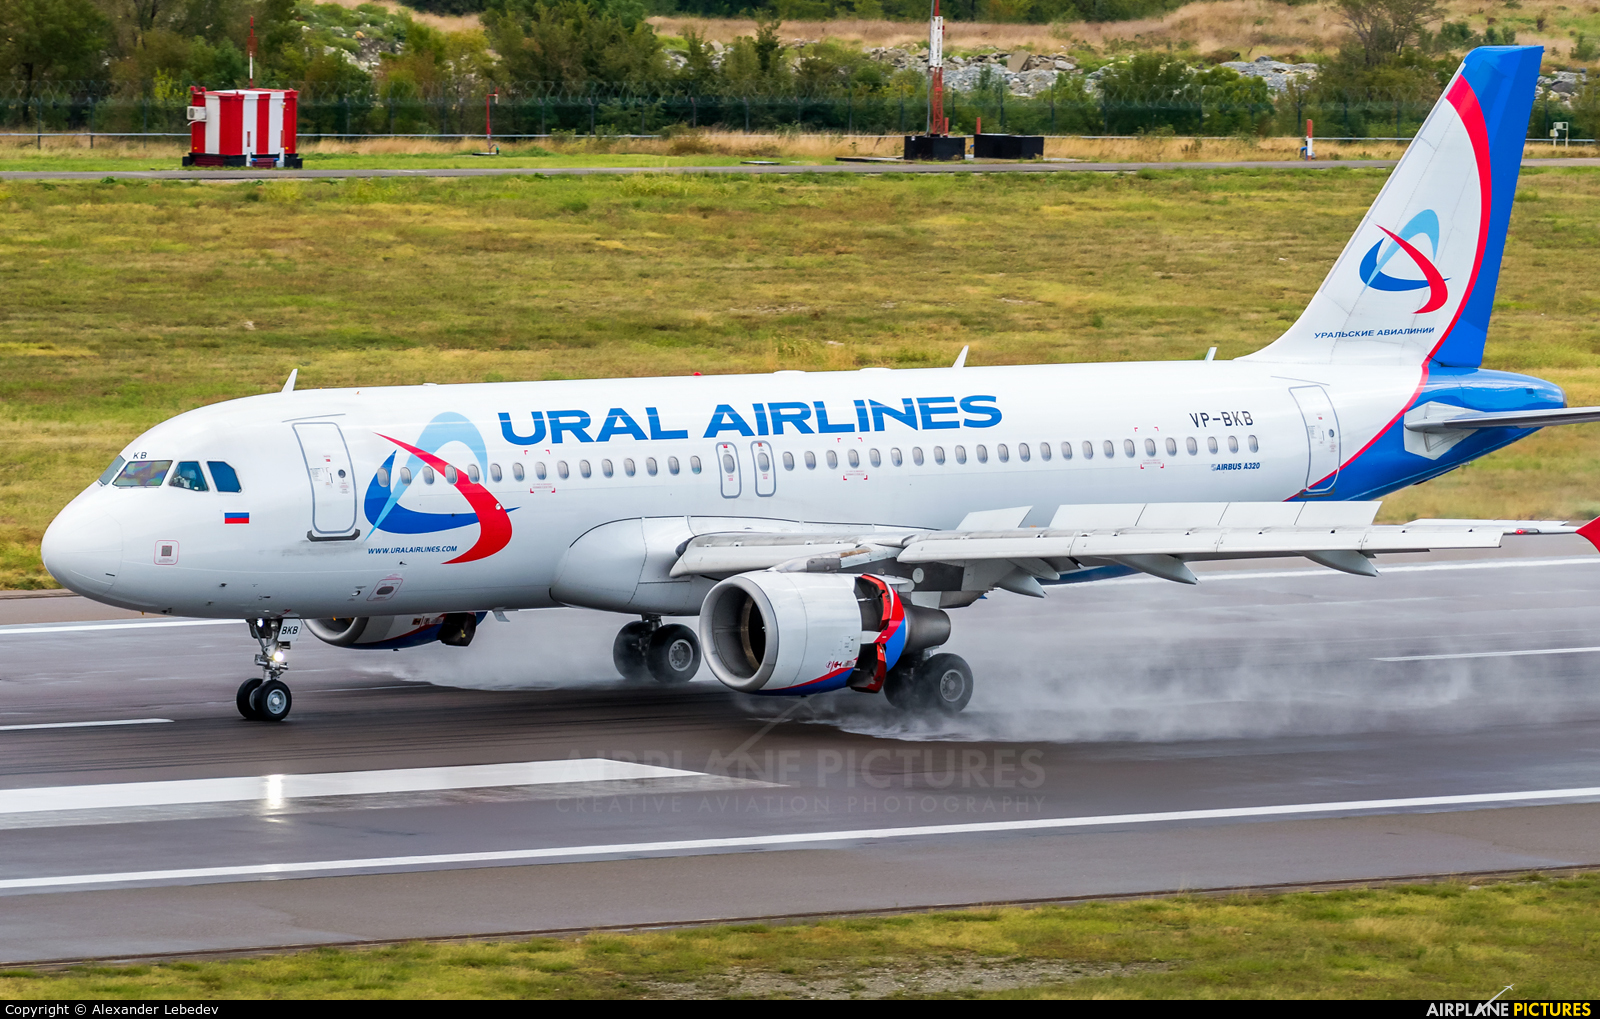 Ural Airlines VP-BKB aircraft at Gelendzhik